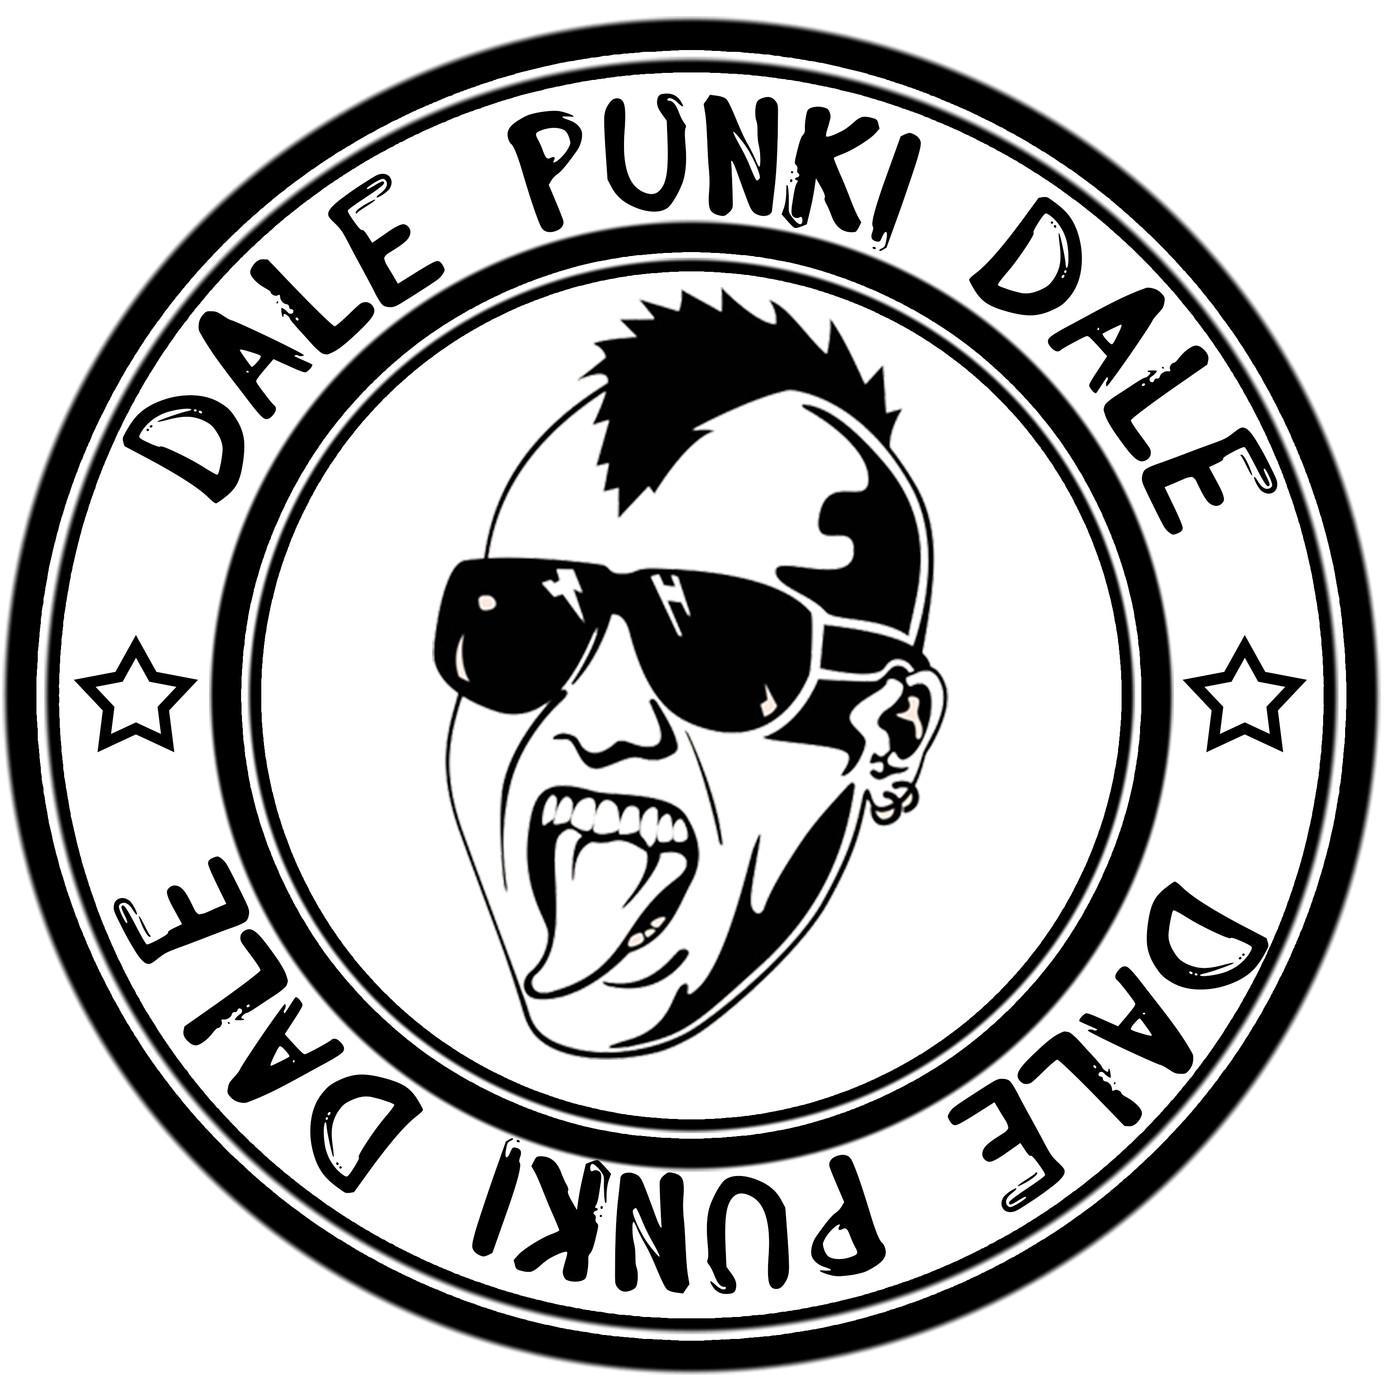 Dale Punki Dale #110 - Entrevista a Adormidera